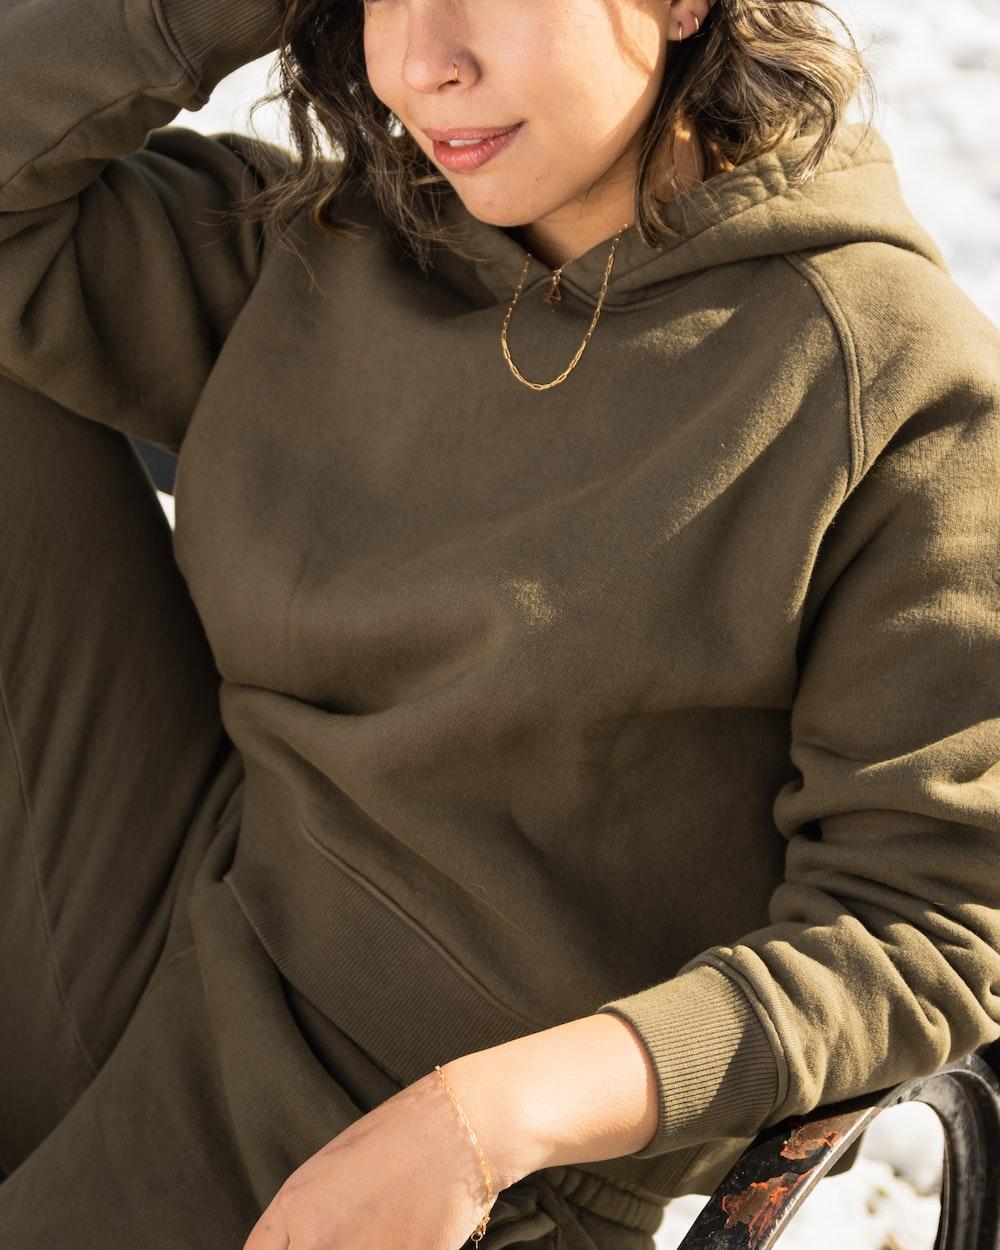 woman in brown zip up jacket